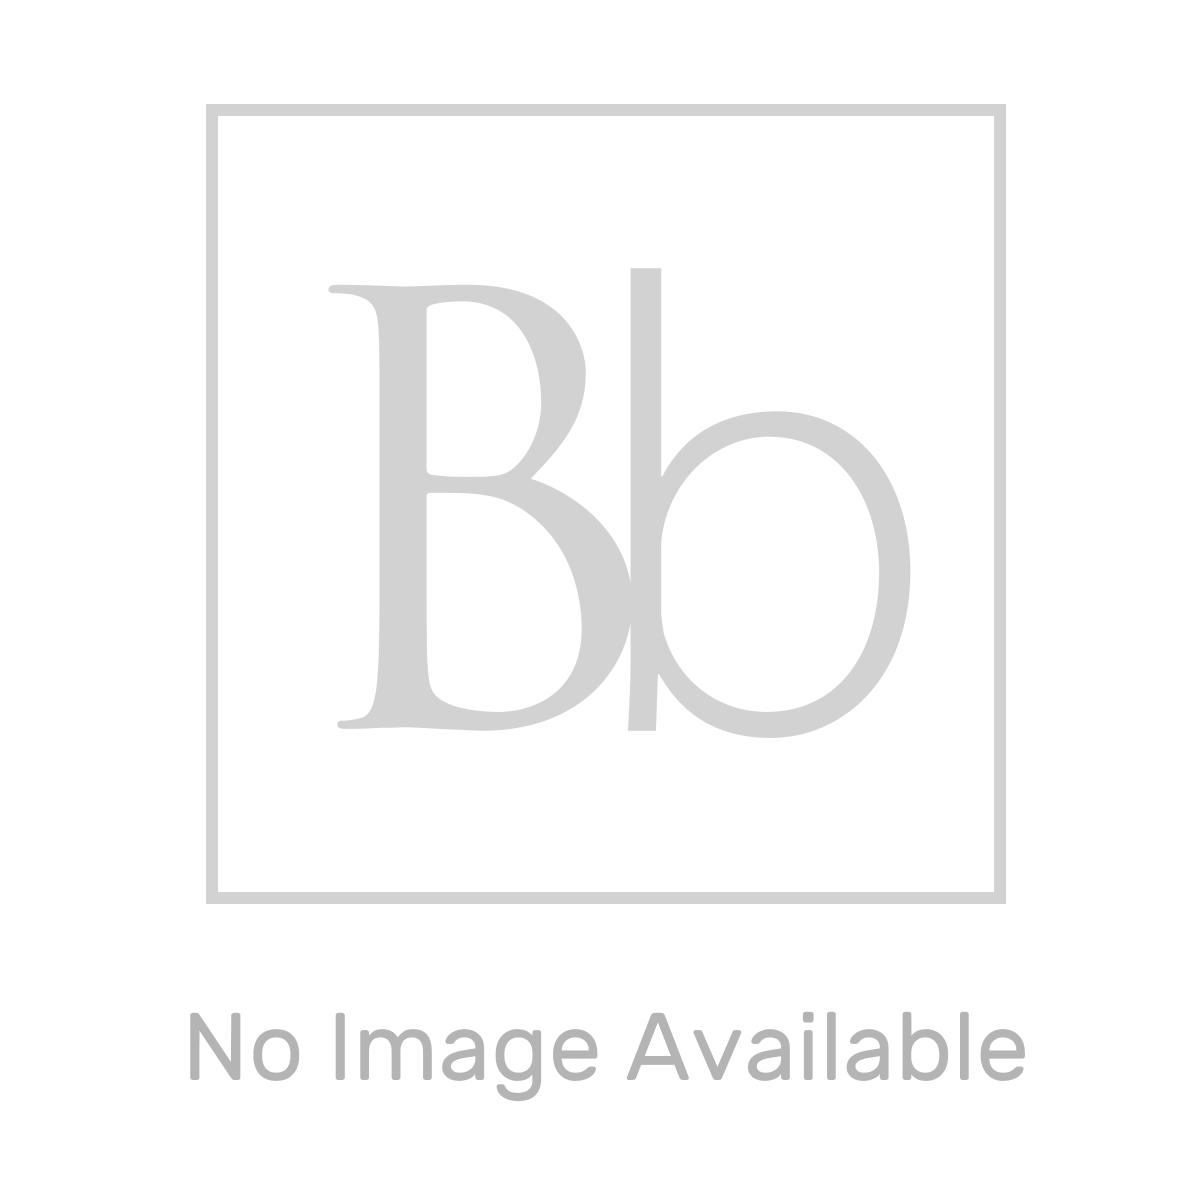 Croydex Euro Soap Dispenser Trio in White